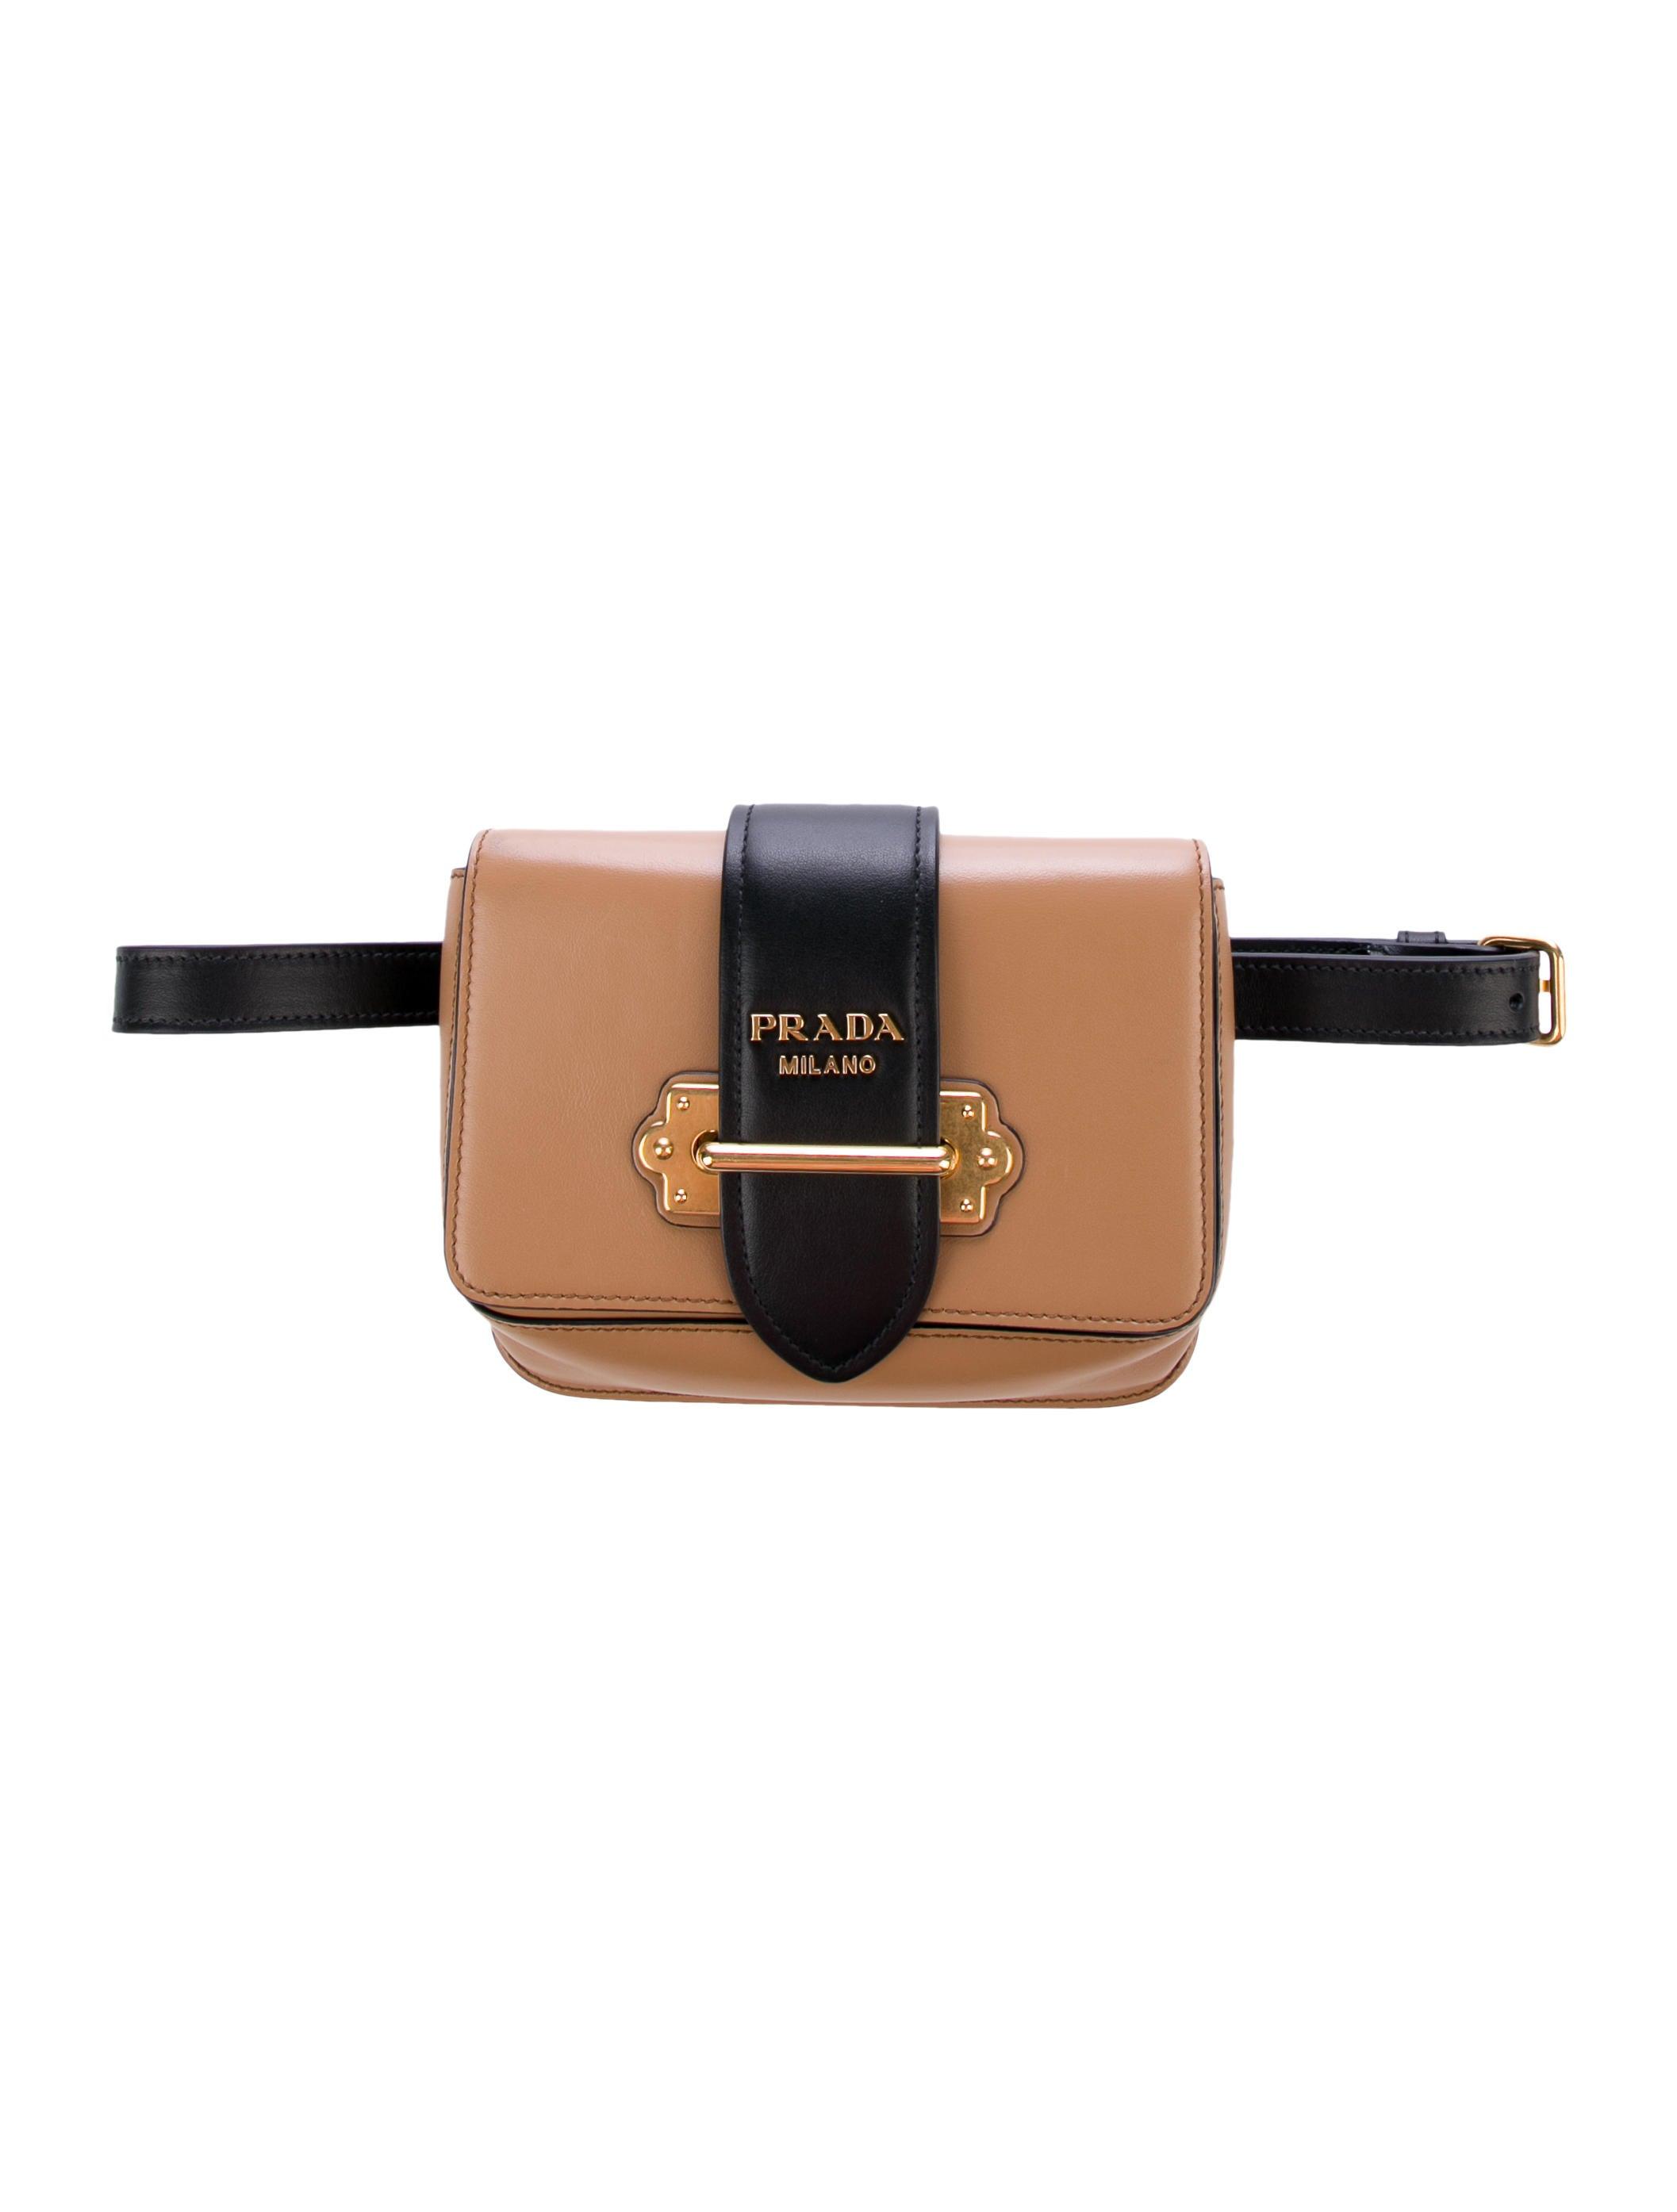 5aaa022031ea Prada Cahier Convertible Belt Bag - Handbags - PRA278194